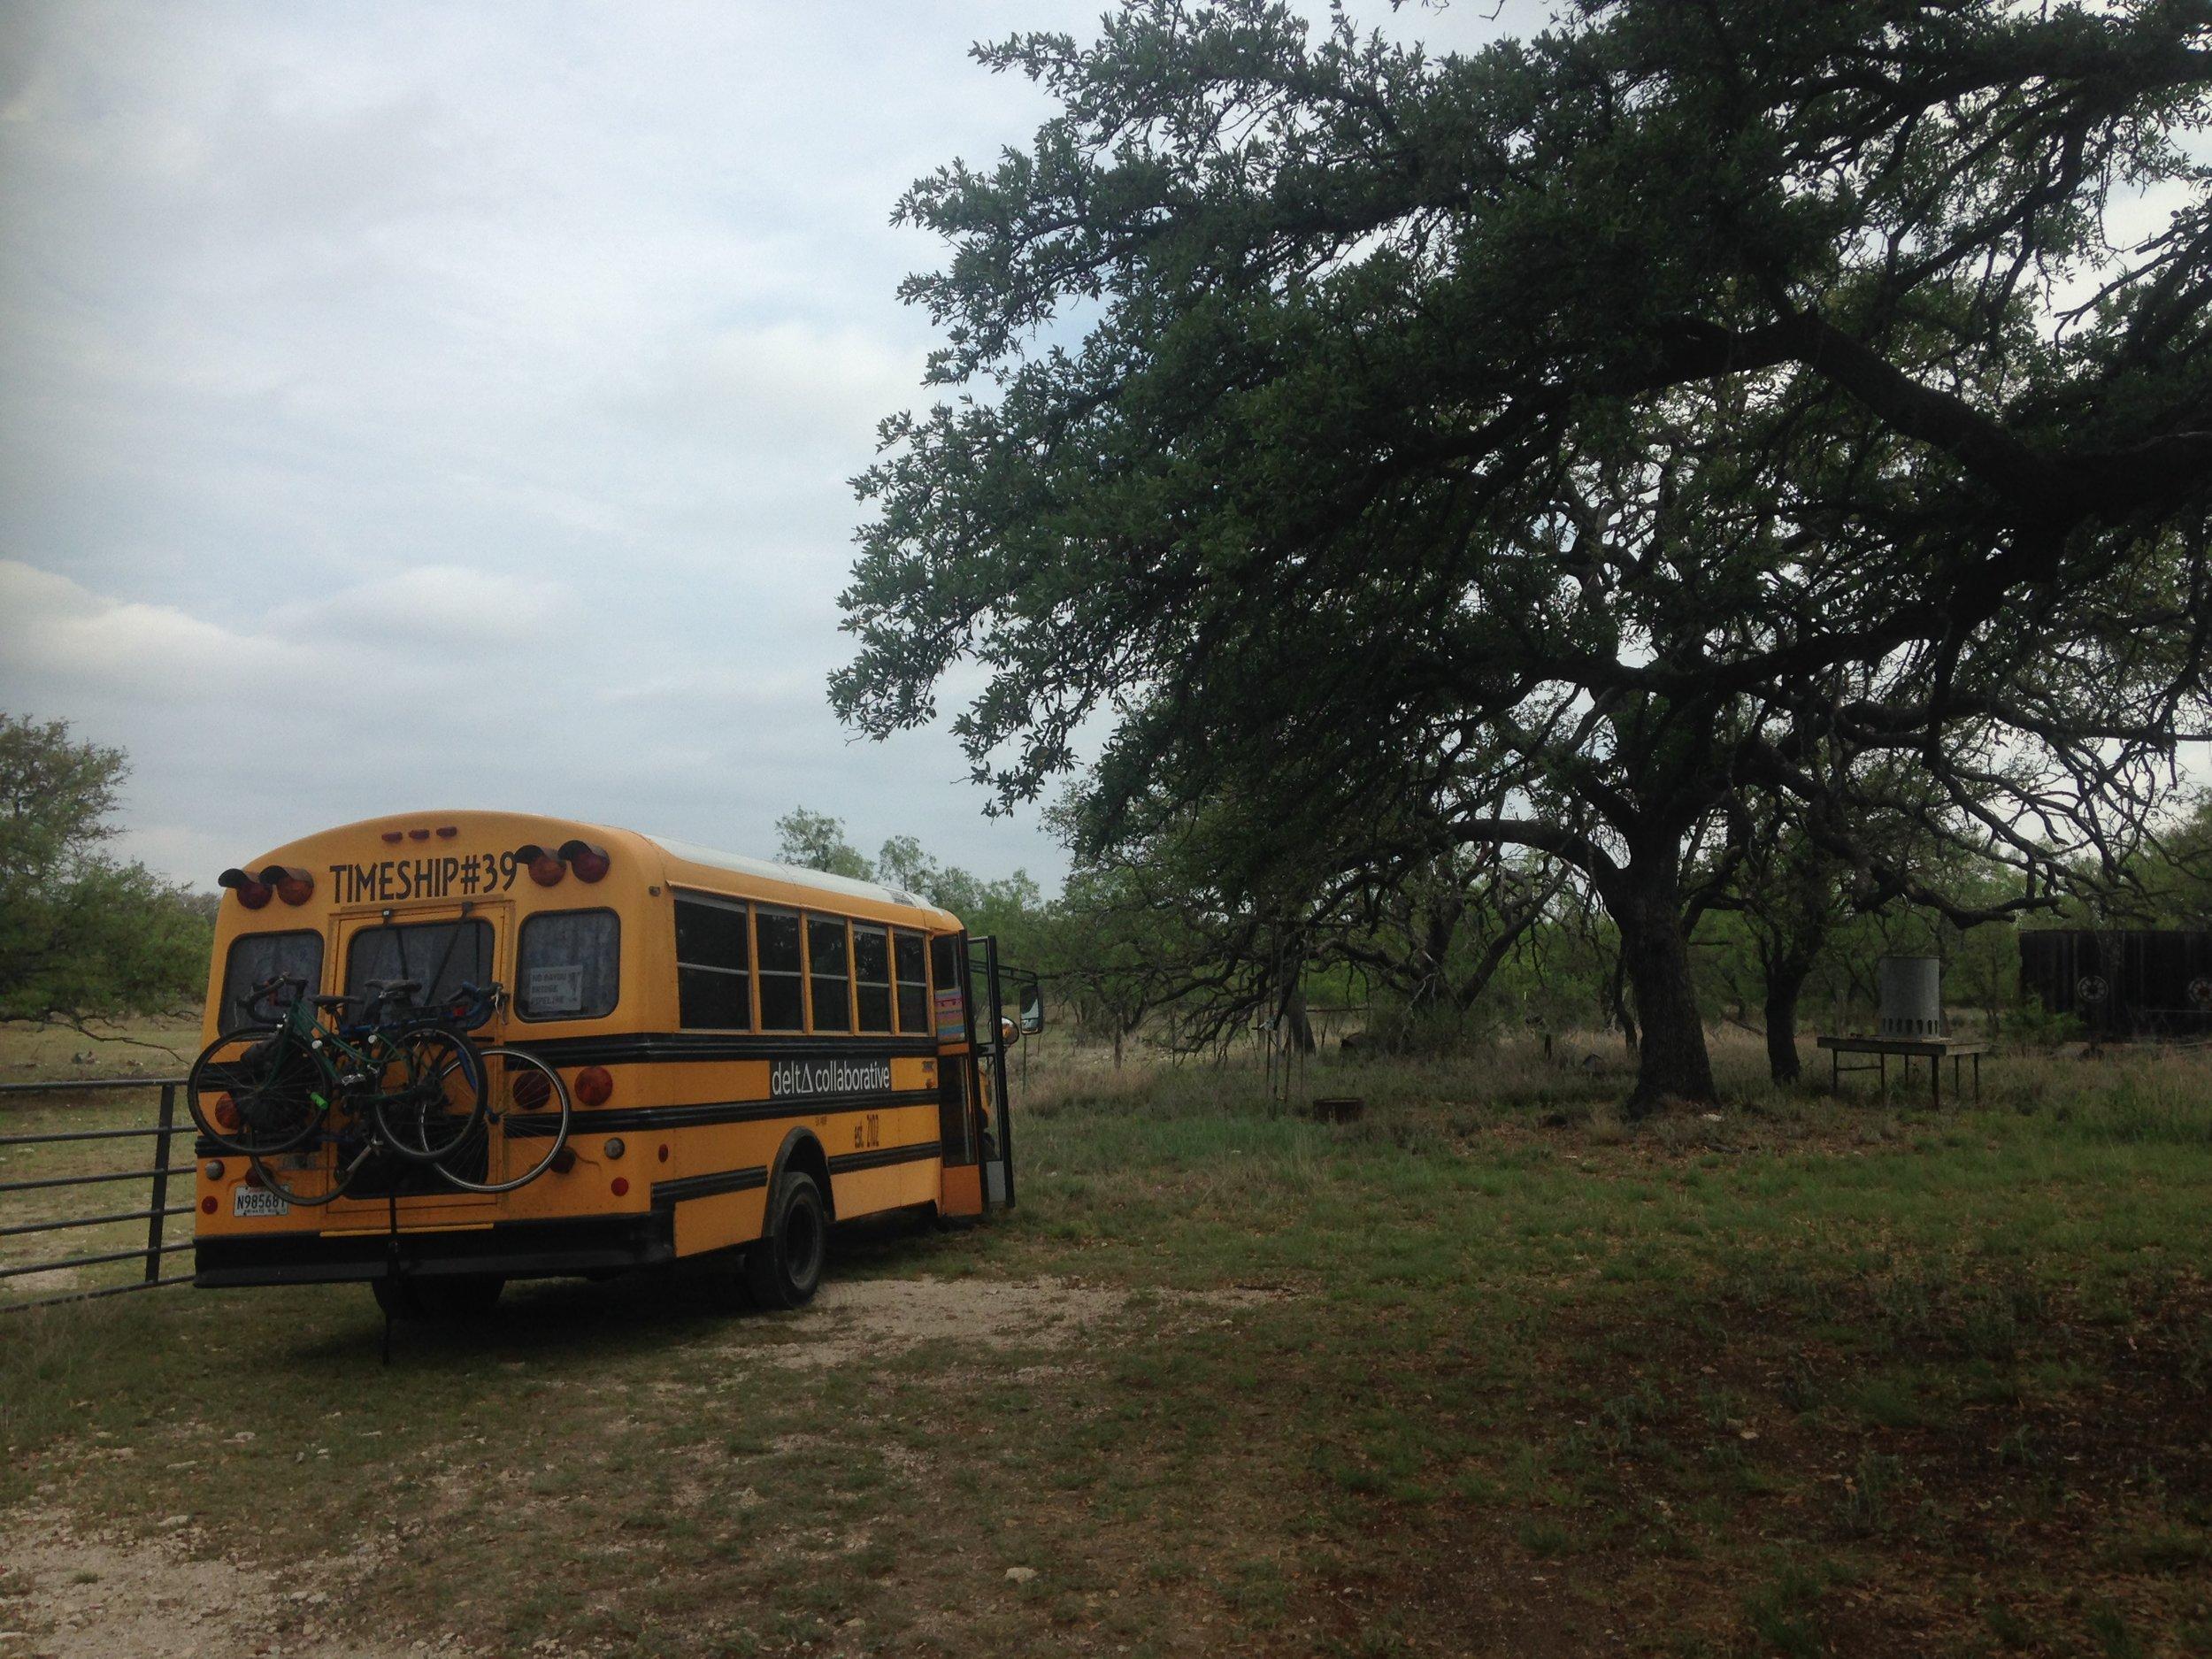 Lynne's ranch and beautiful oak trees.